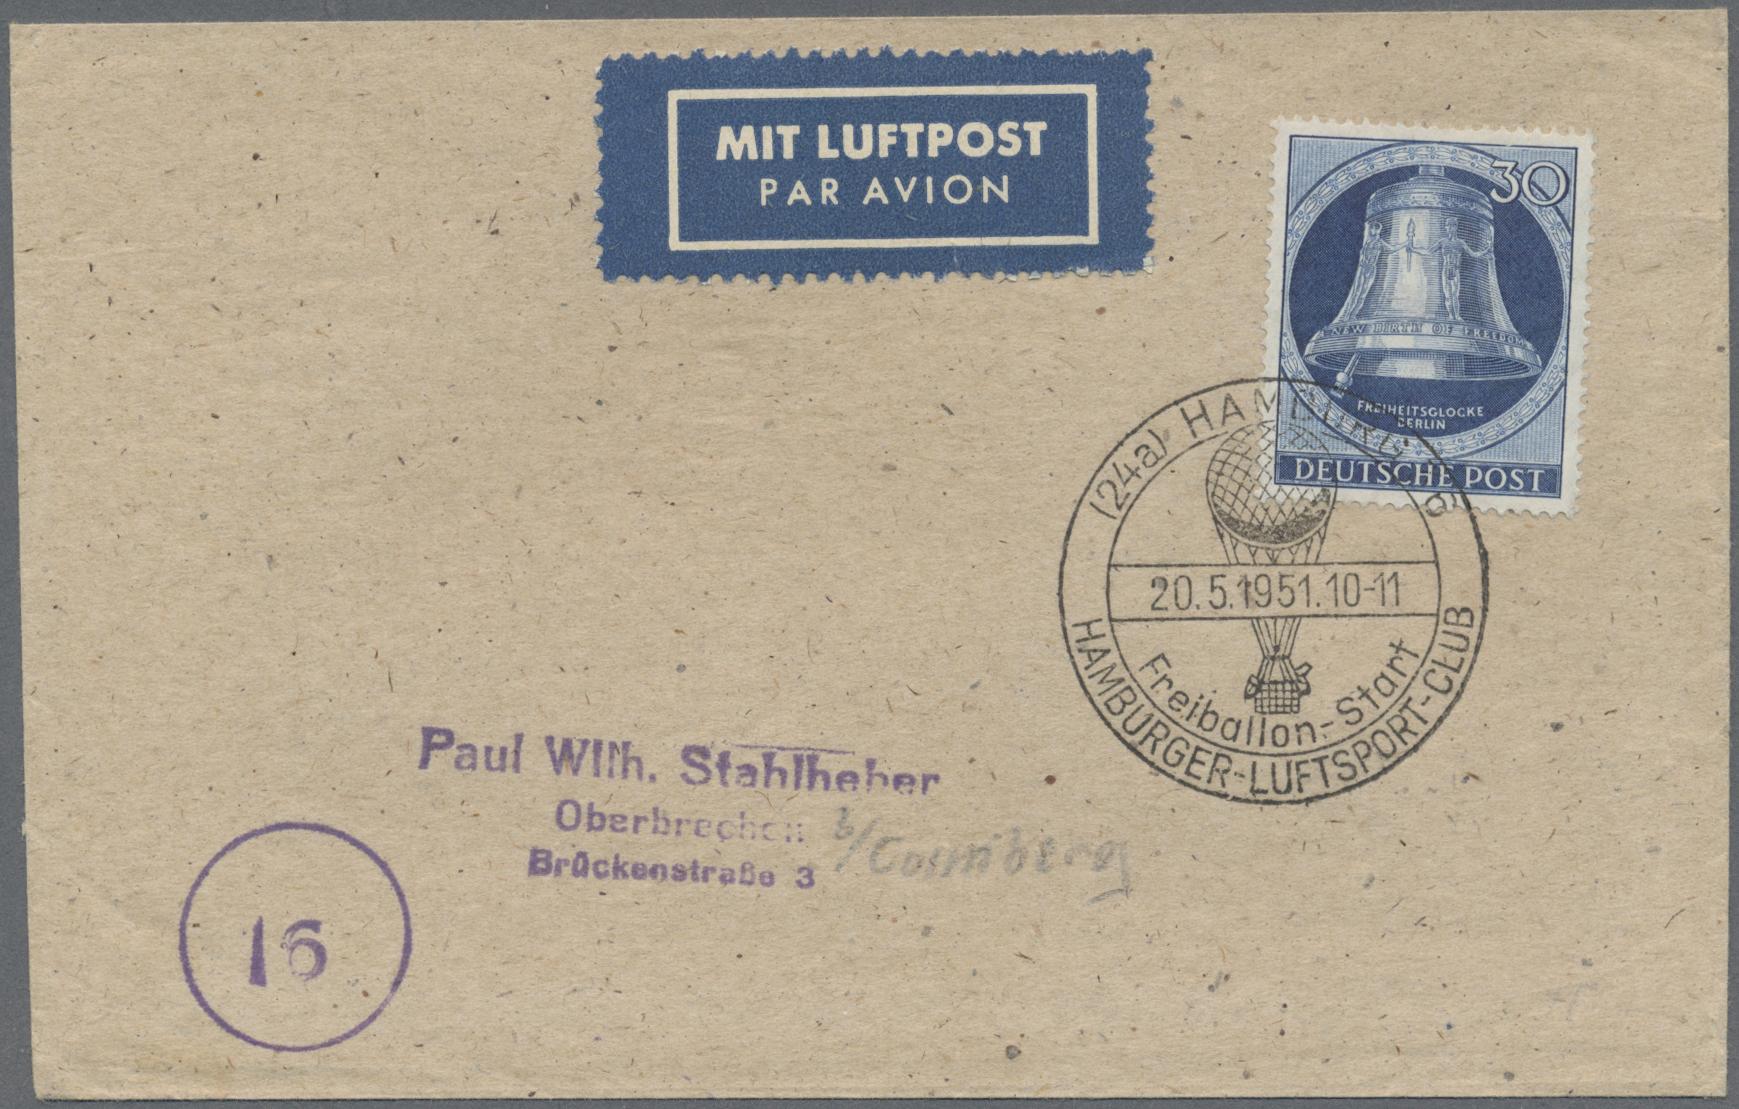 Lot 38087 - bundesrepublik und berlin  -  Auktionshaus Christoph Gärtner GmbH & Co. KG Collections Germany,  Collections Supplement, Surprise boxes #39 Day 7